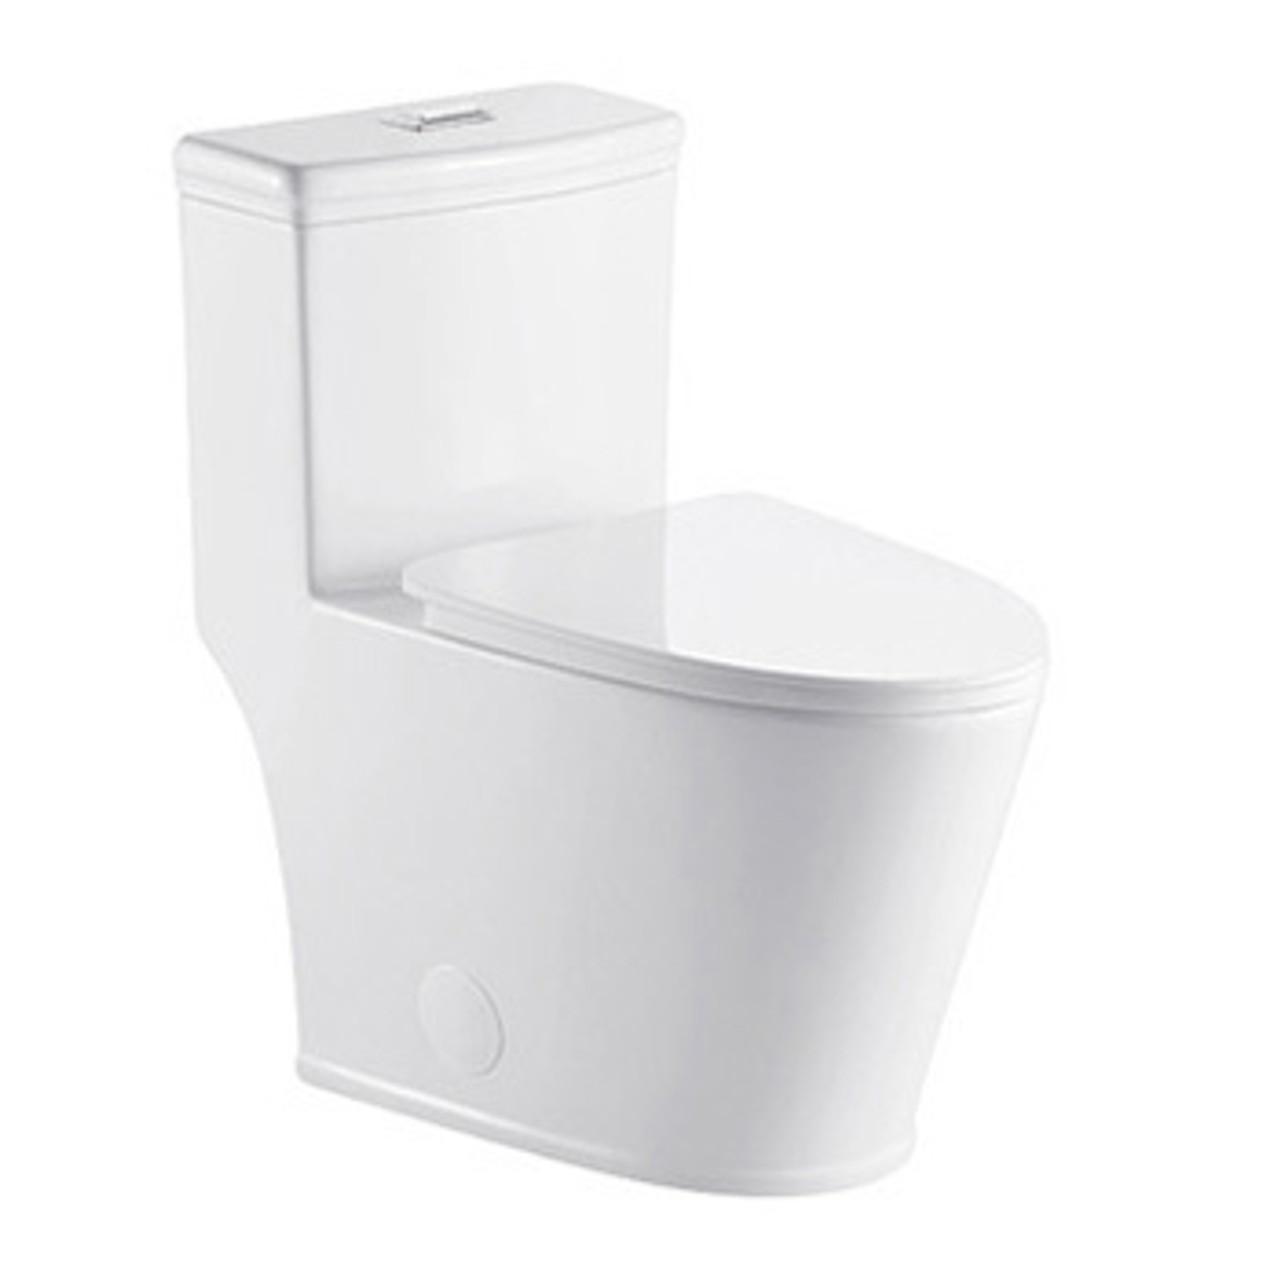 Stupendous One Piece Dual Flush Toilet W Soft Closing Seat Upc Approval K0398 Lamtechconsult Wood Chair Design Ideas Lamtechconsultcom